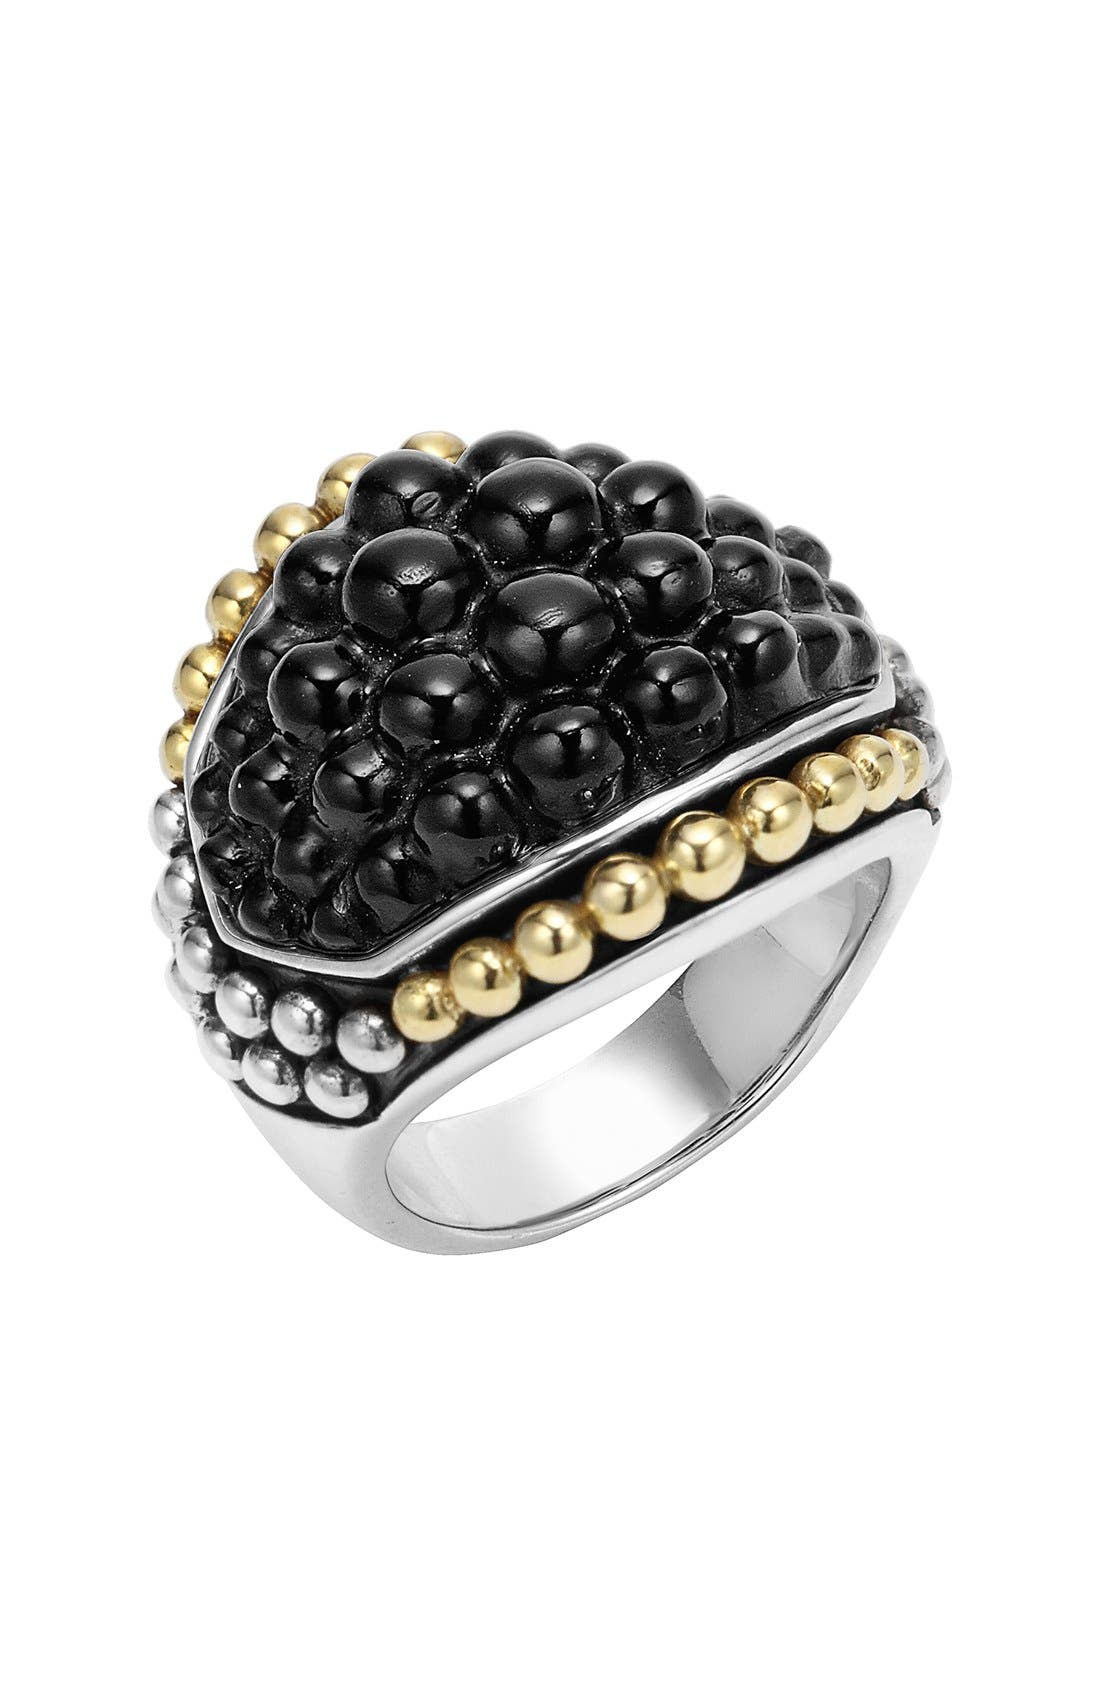 LAGOS 'Black Caviar' Dome Ring